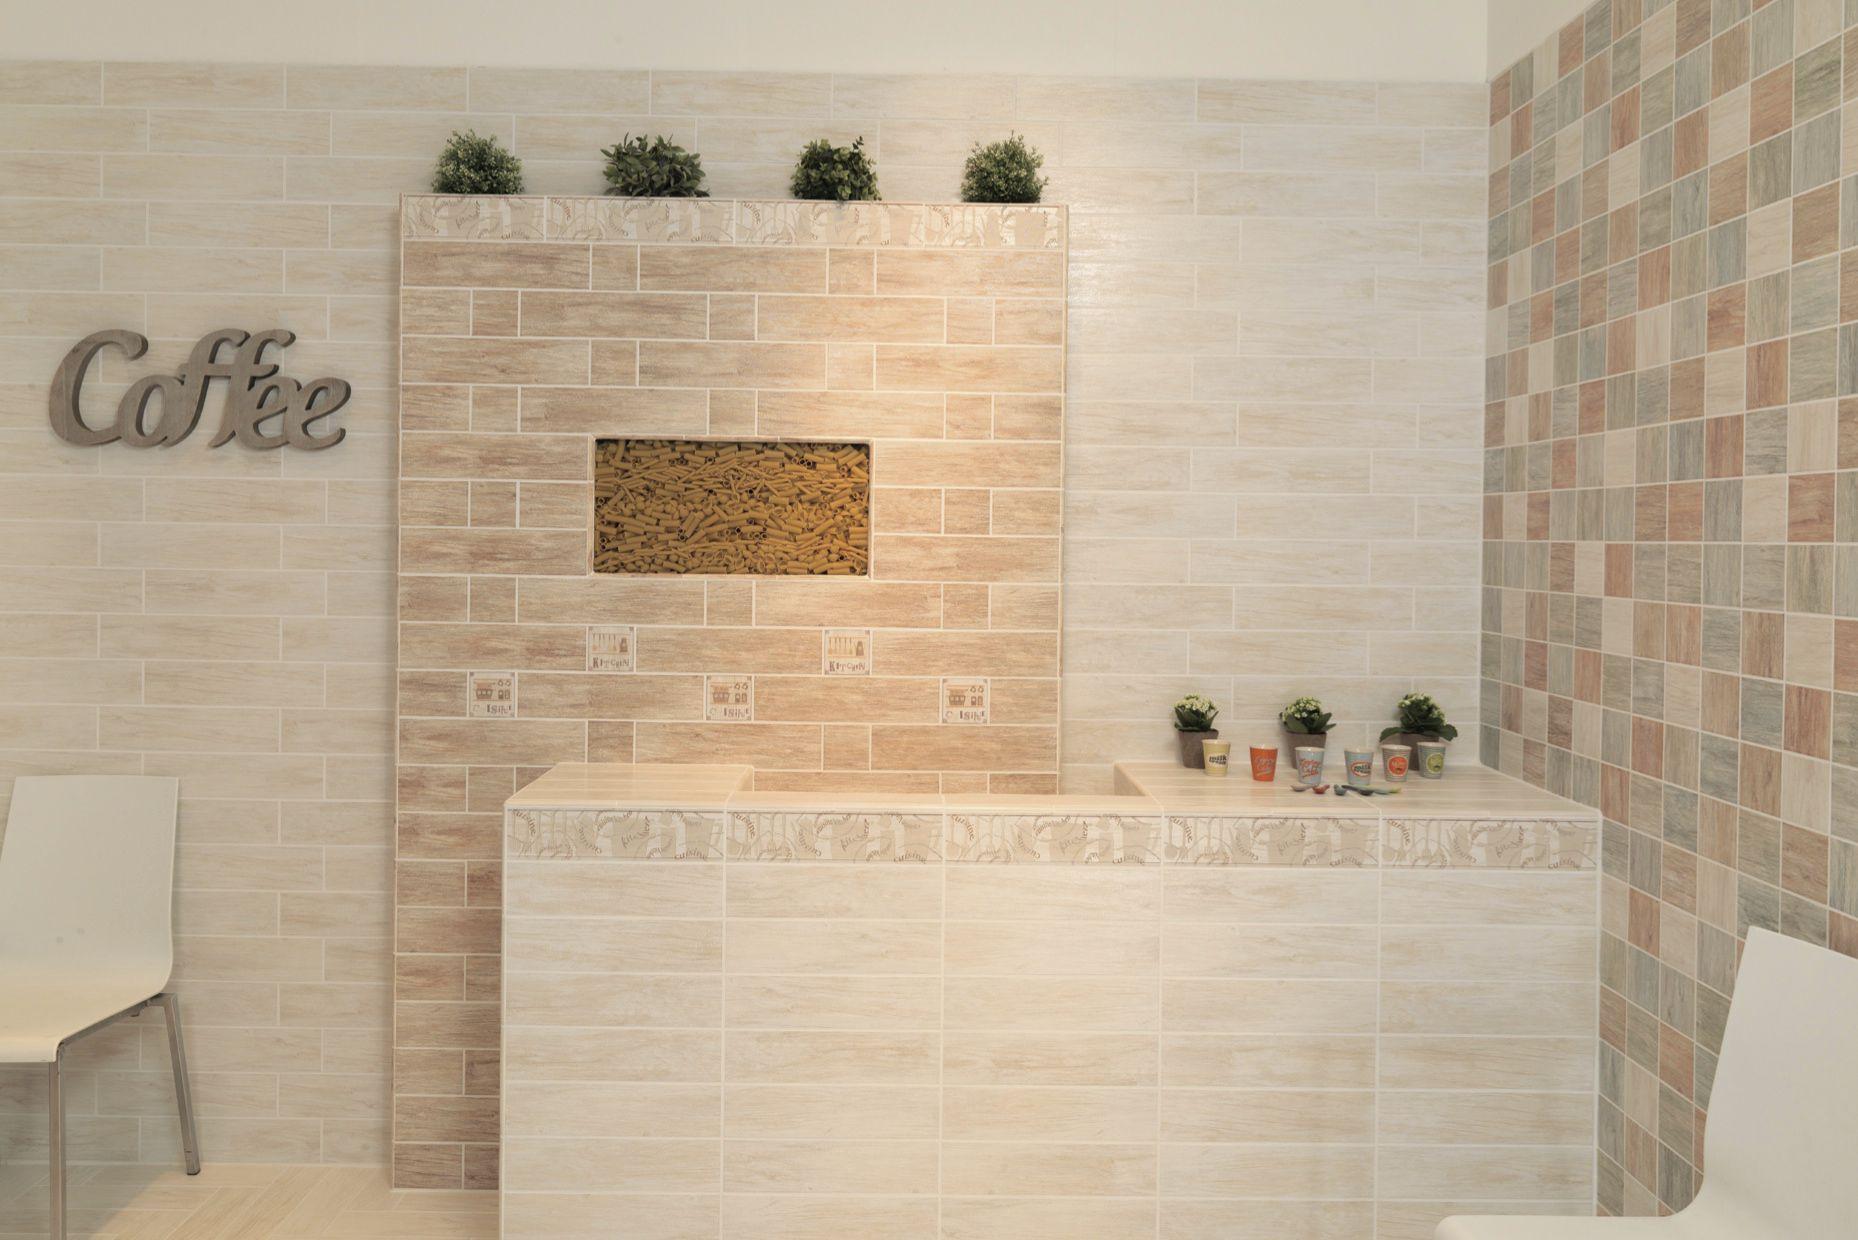 Küchenfliesen wand keramik motiv ldv cucine ceramica alta